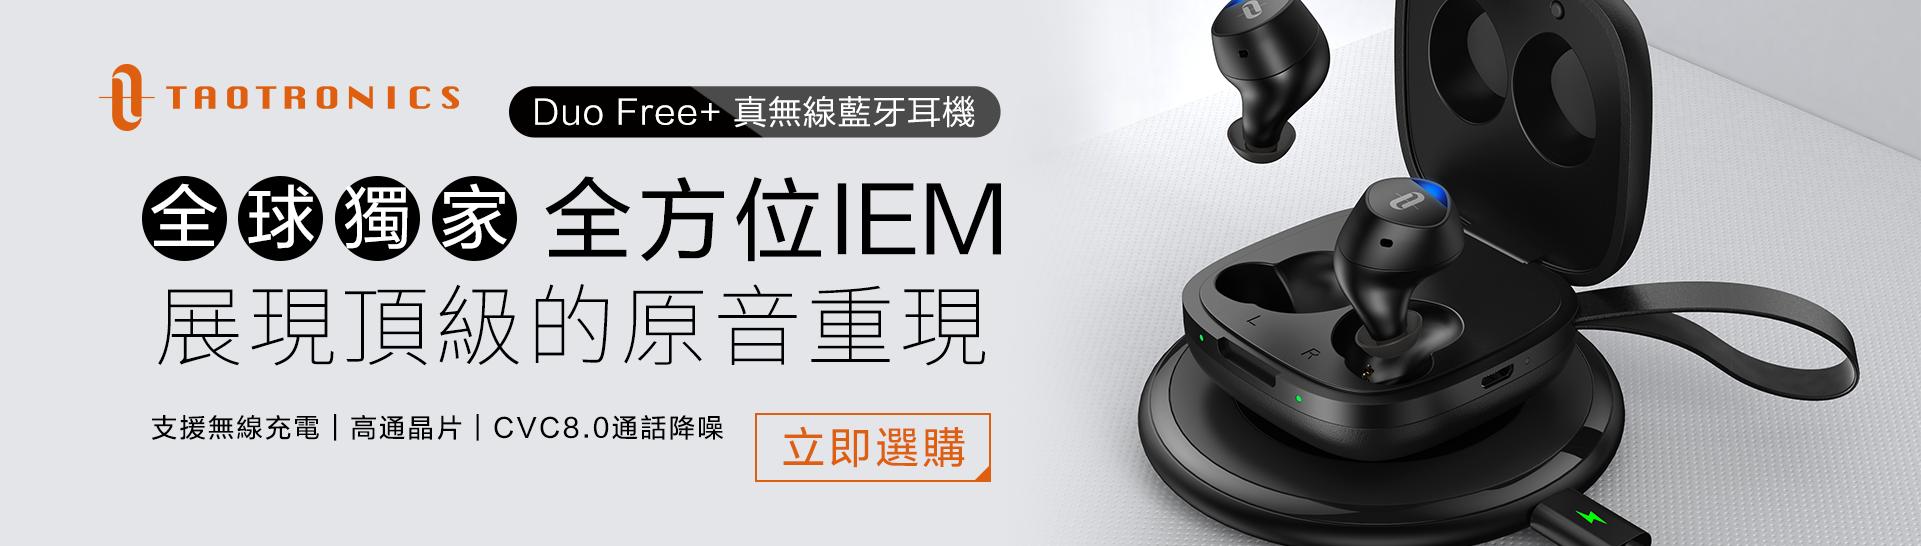 A2 TaoTronics Duo Free+ 真無線藍牙耳機|WitsPer智選家